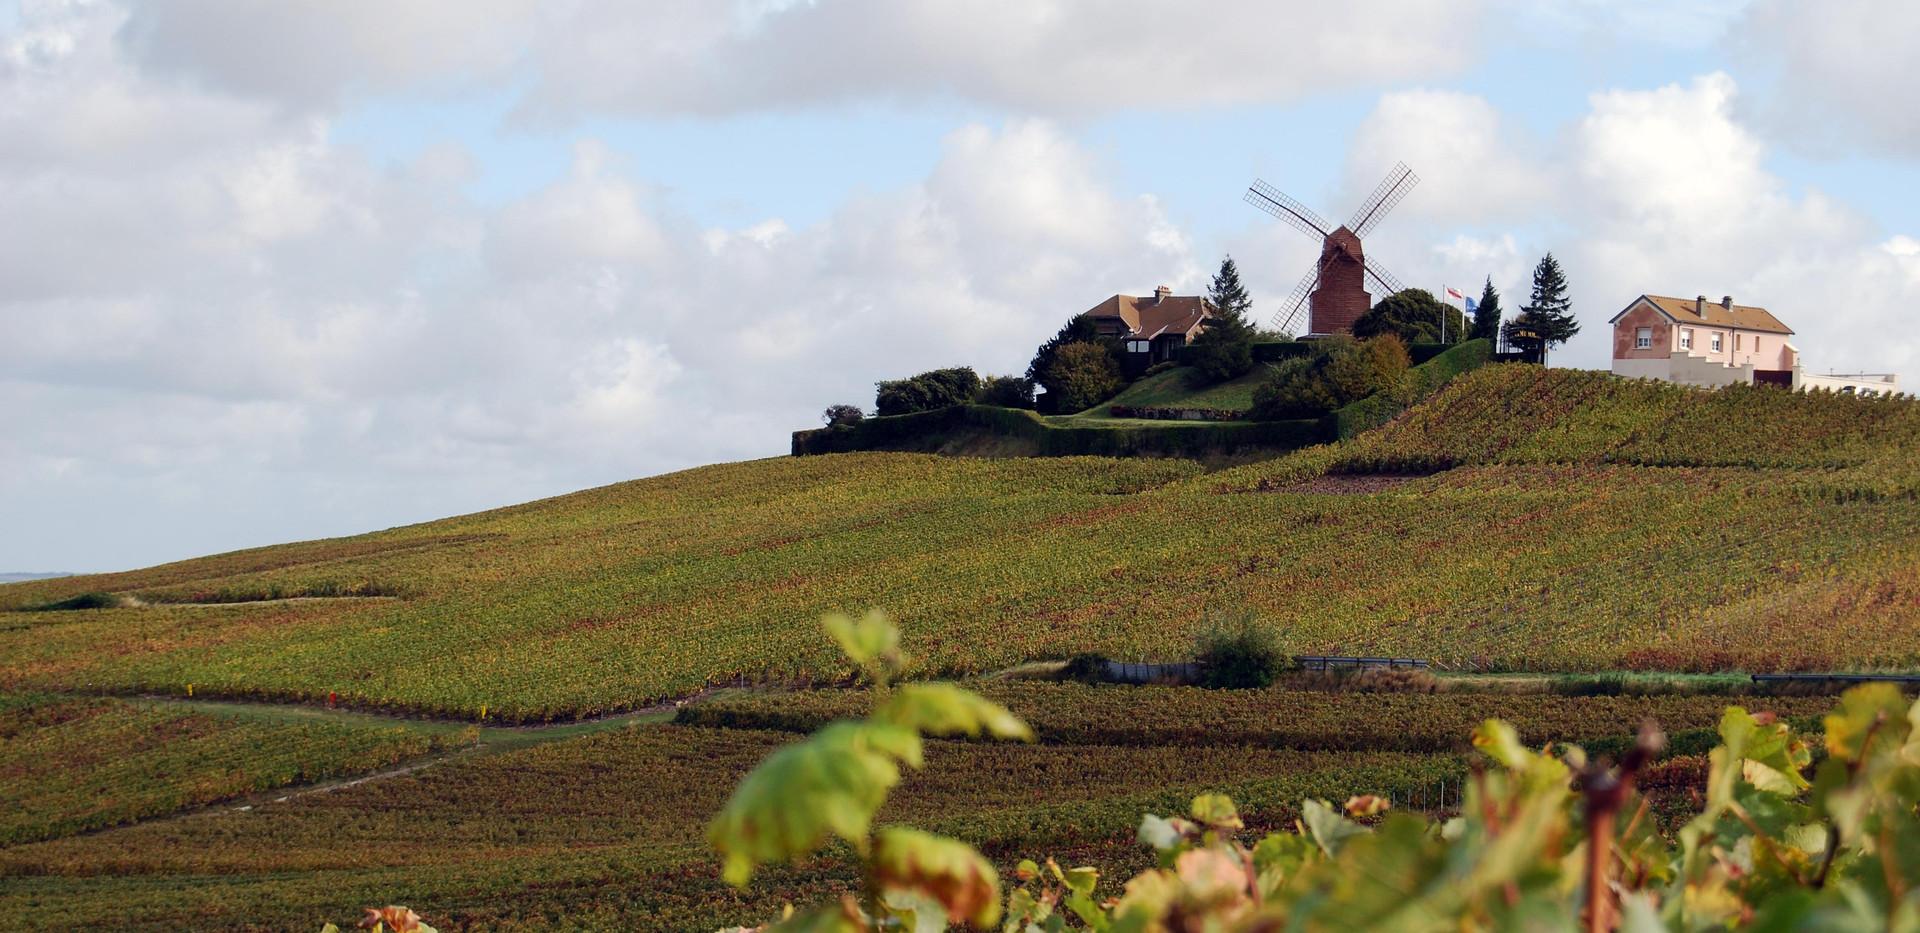 Verzenay windmill